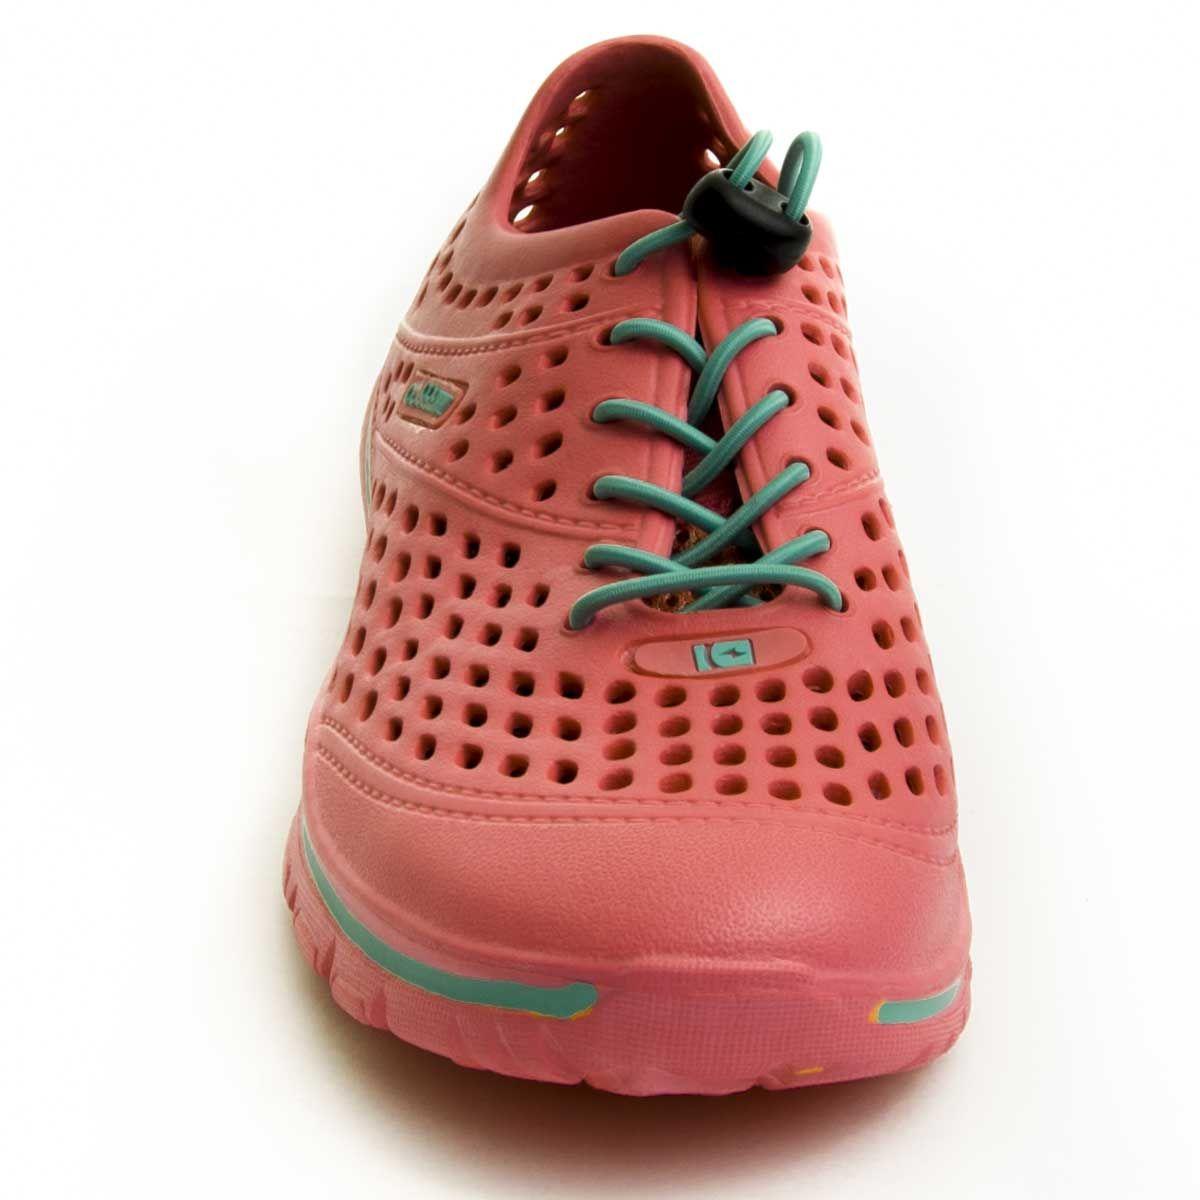 Montevita Sporty Sneaker in Fuchsia